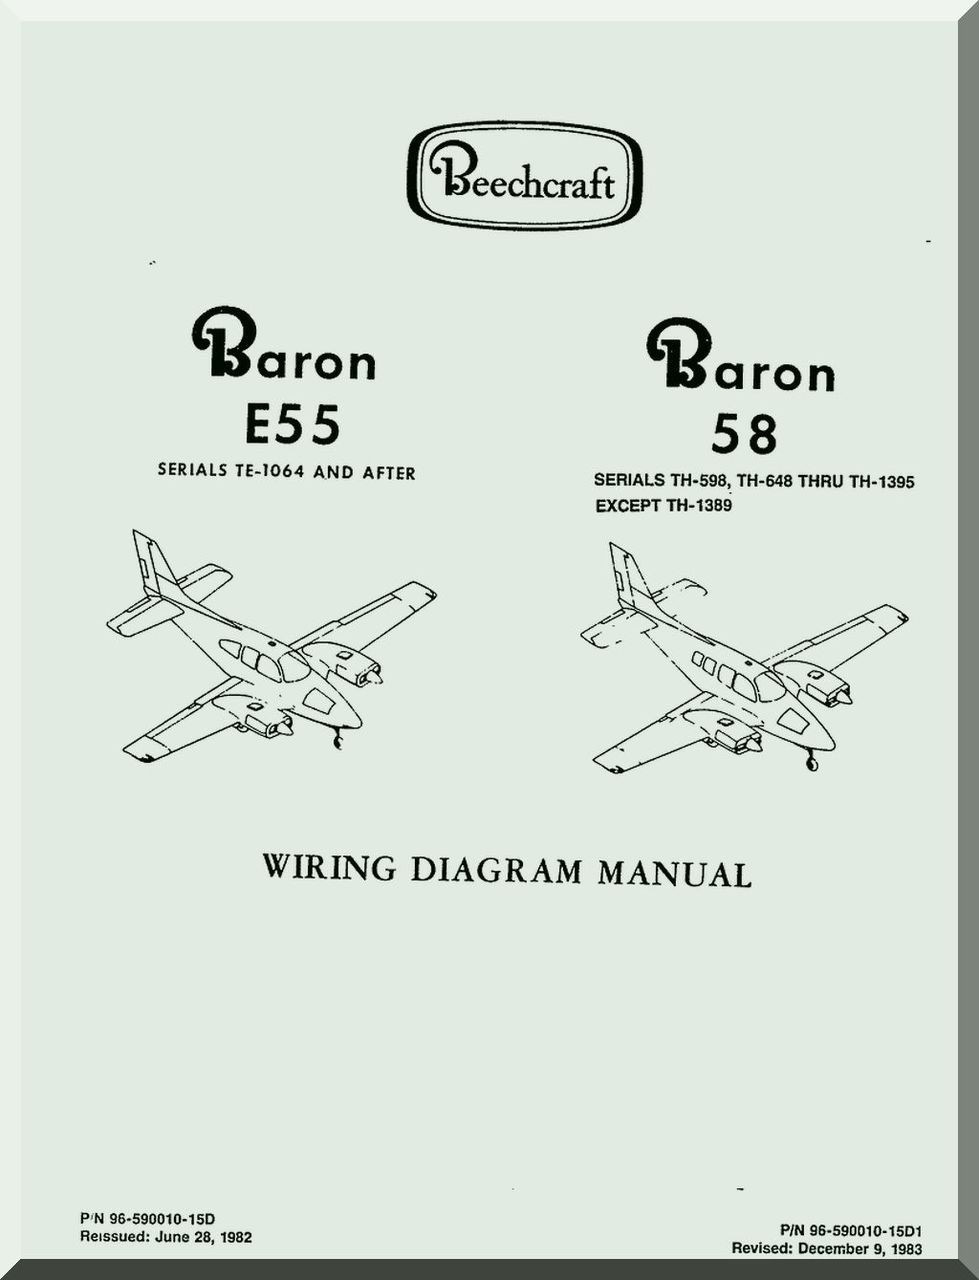 Aircraft Intercom Wiring Diagram – Intercom Wiring-diagram